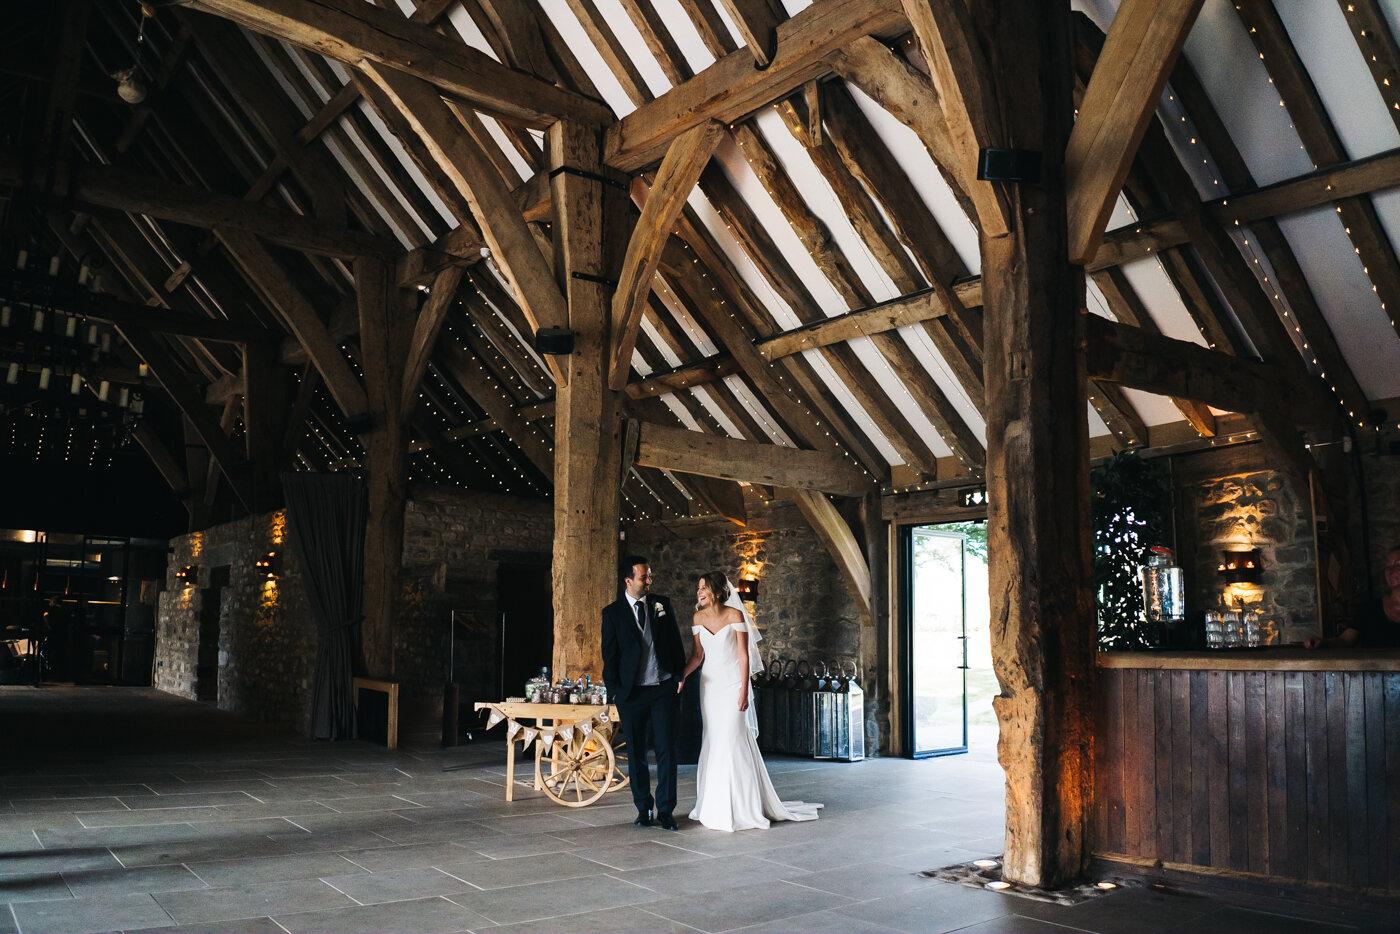 tithe-barn-bolton-abbey-north-yorkshire-cripps-wedding-photographer-creative-0043.jpg